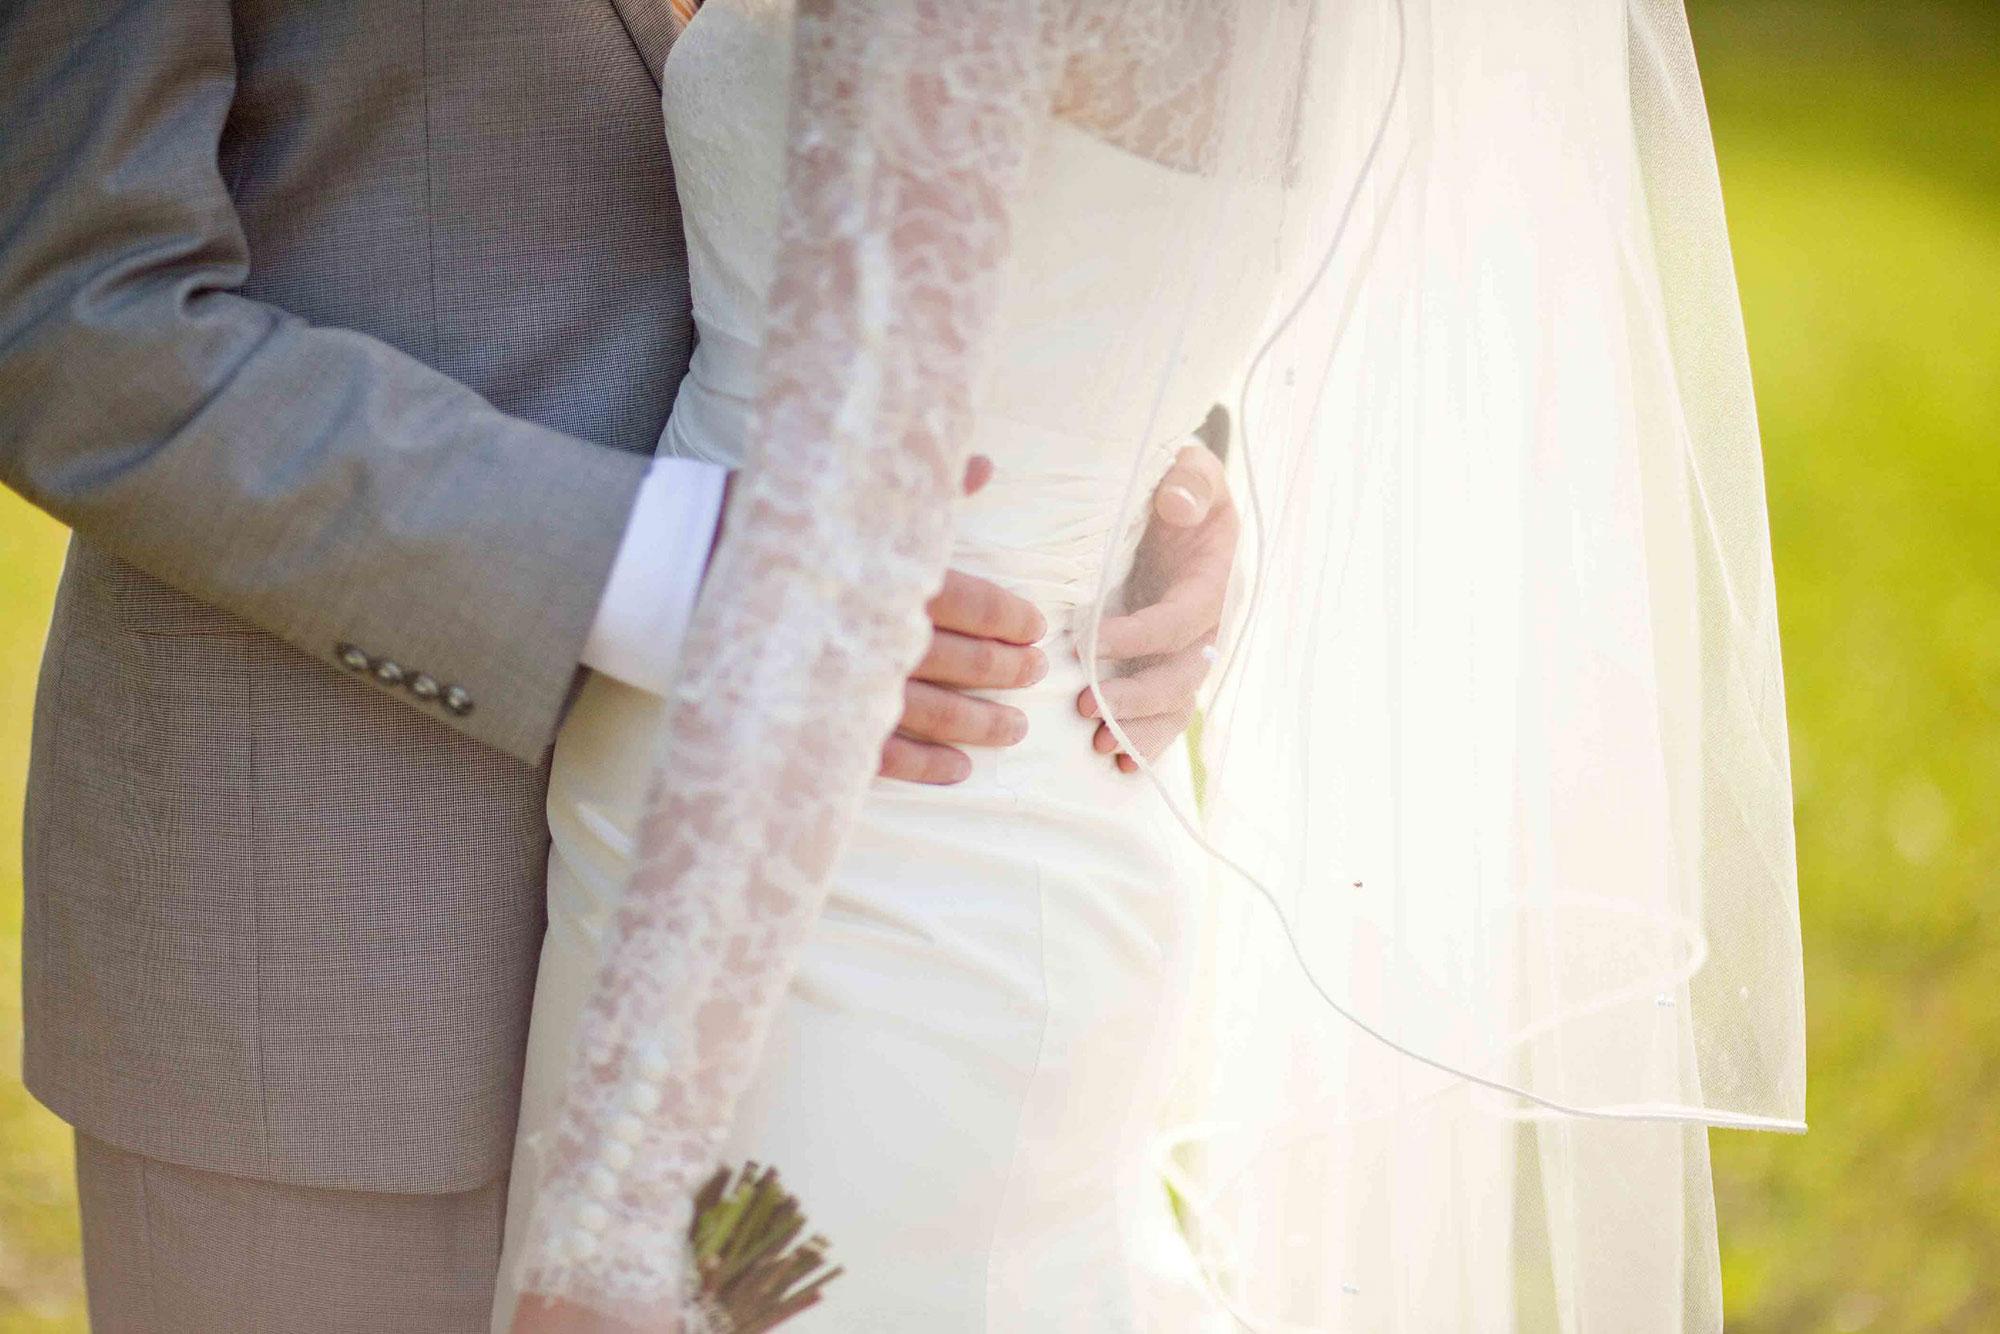 Amanda-Cowley-Willowbank-Vineyard-Bride-Photo-By-White-Photographie-033.jpg